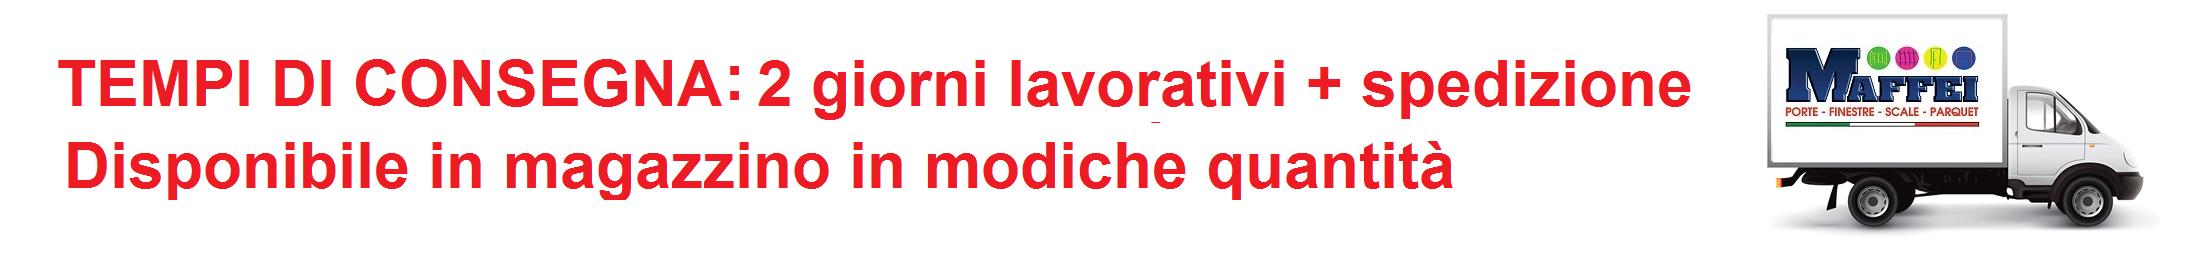 L-Copia